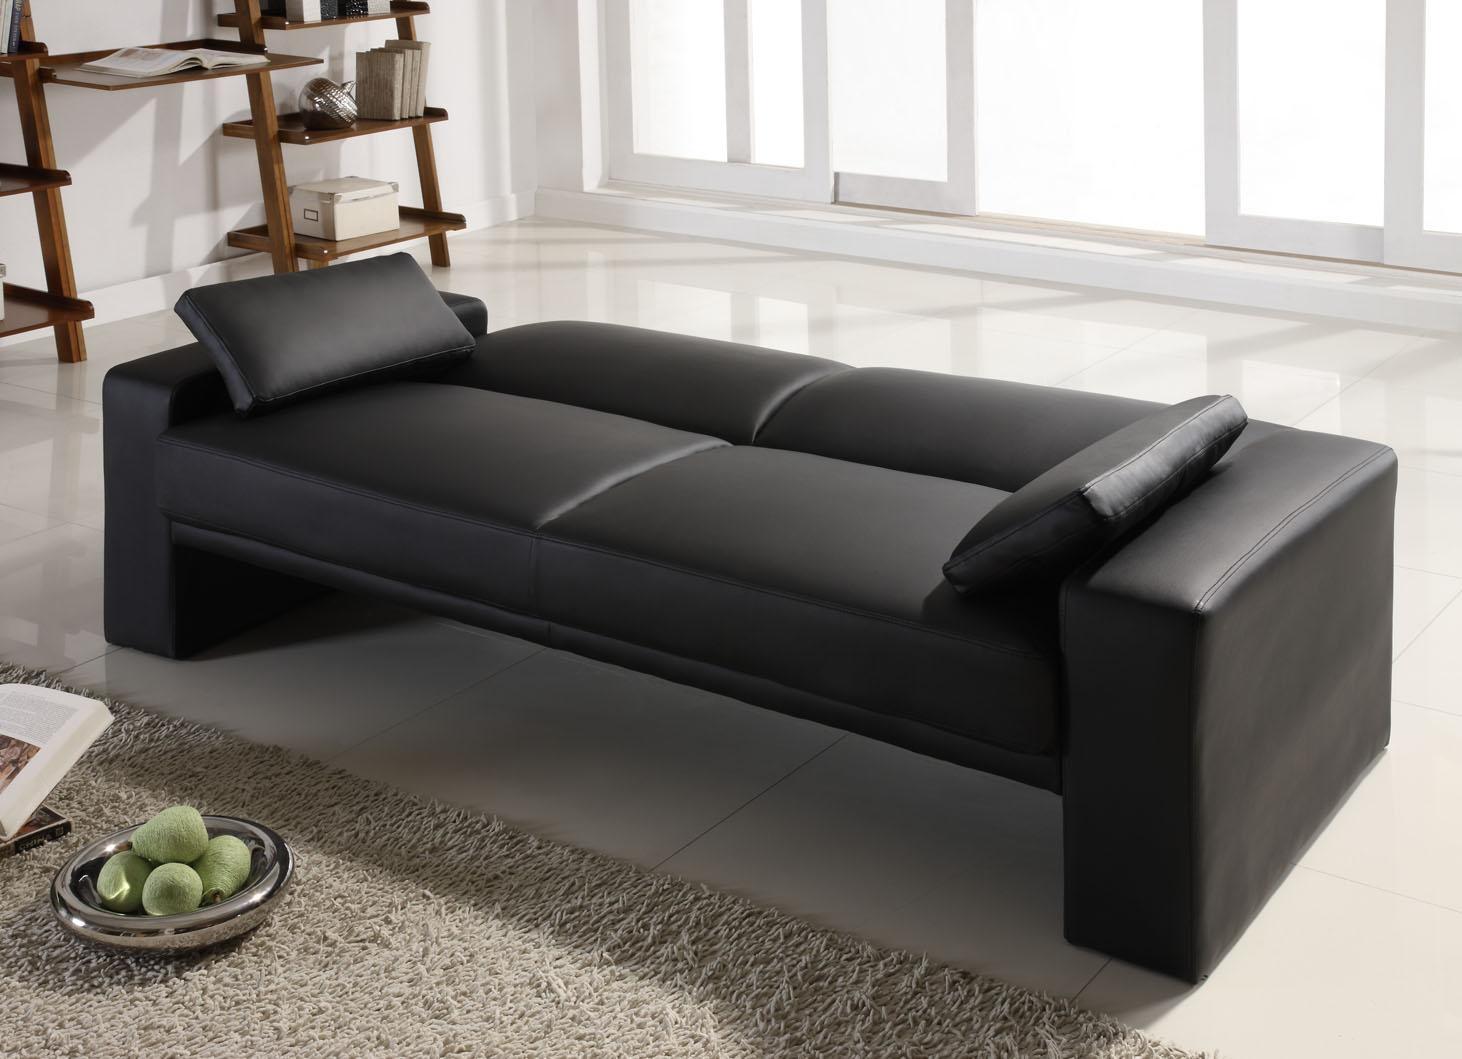 Sofas Center : Bycast Leather Futon Sofa Emily Faux Convertible Throughout Faux Leather Futon Sofas (Image 16 of 20)